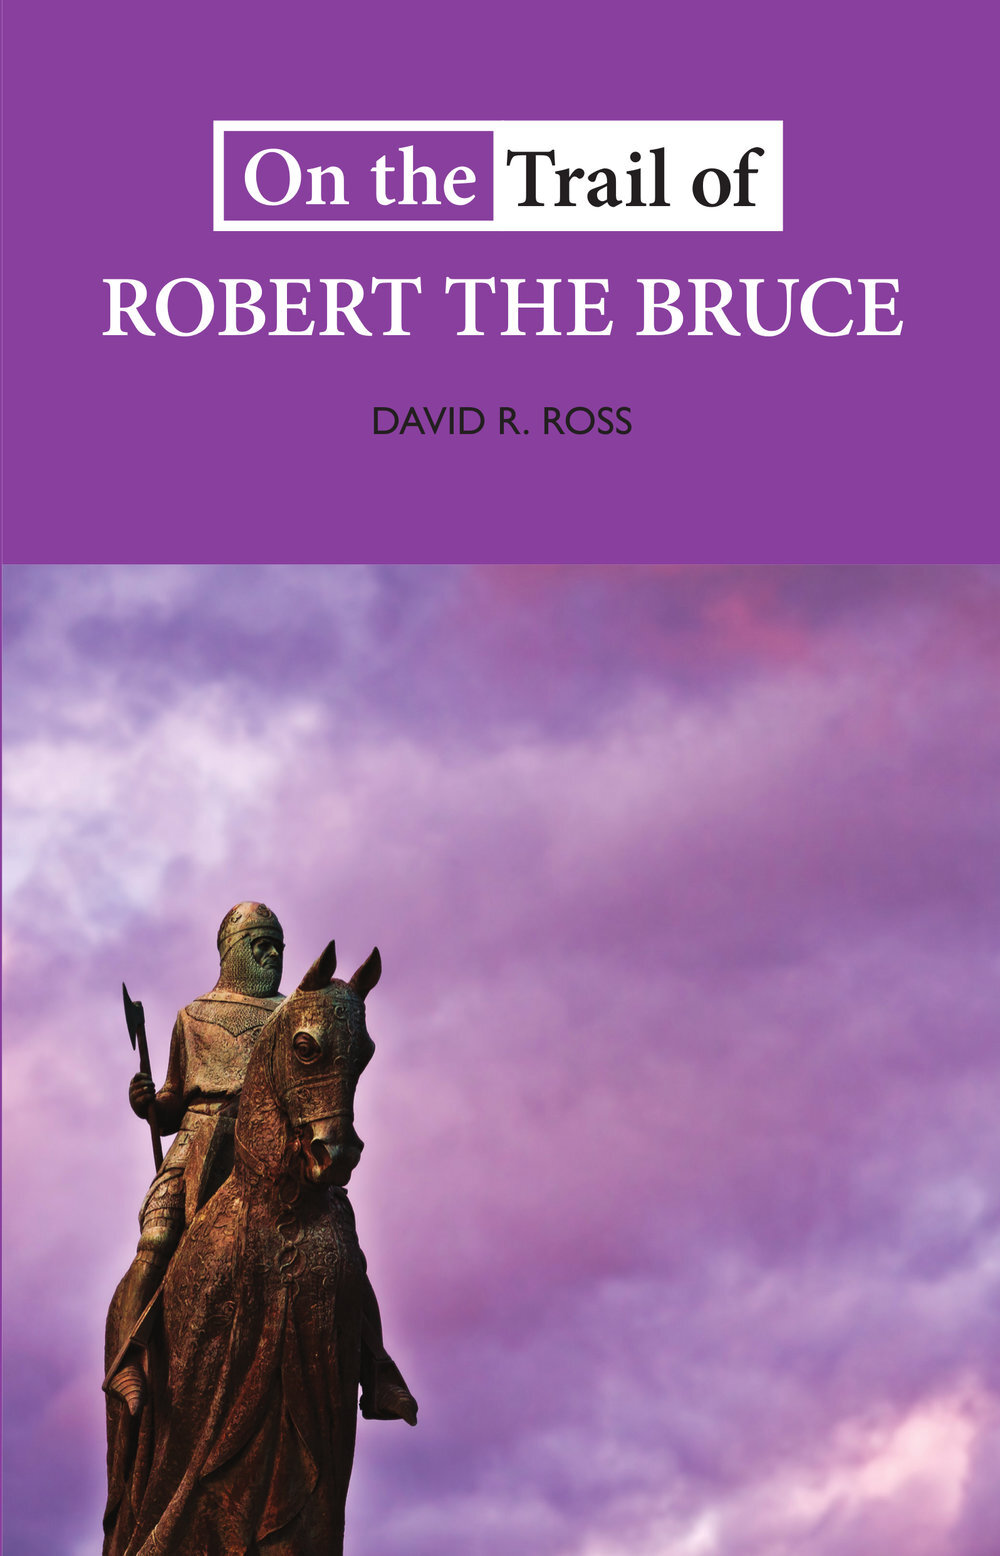 On+the+Trail+of+Robert+the+Bruce+David+R+Ross+9781913025137+Luath+Press.jpg